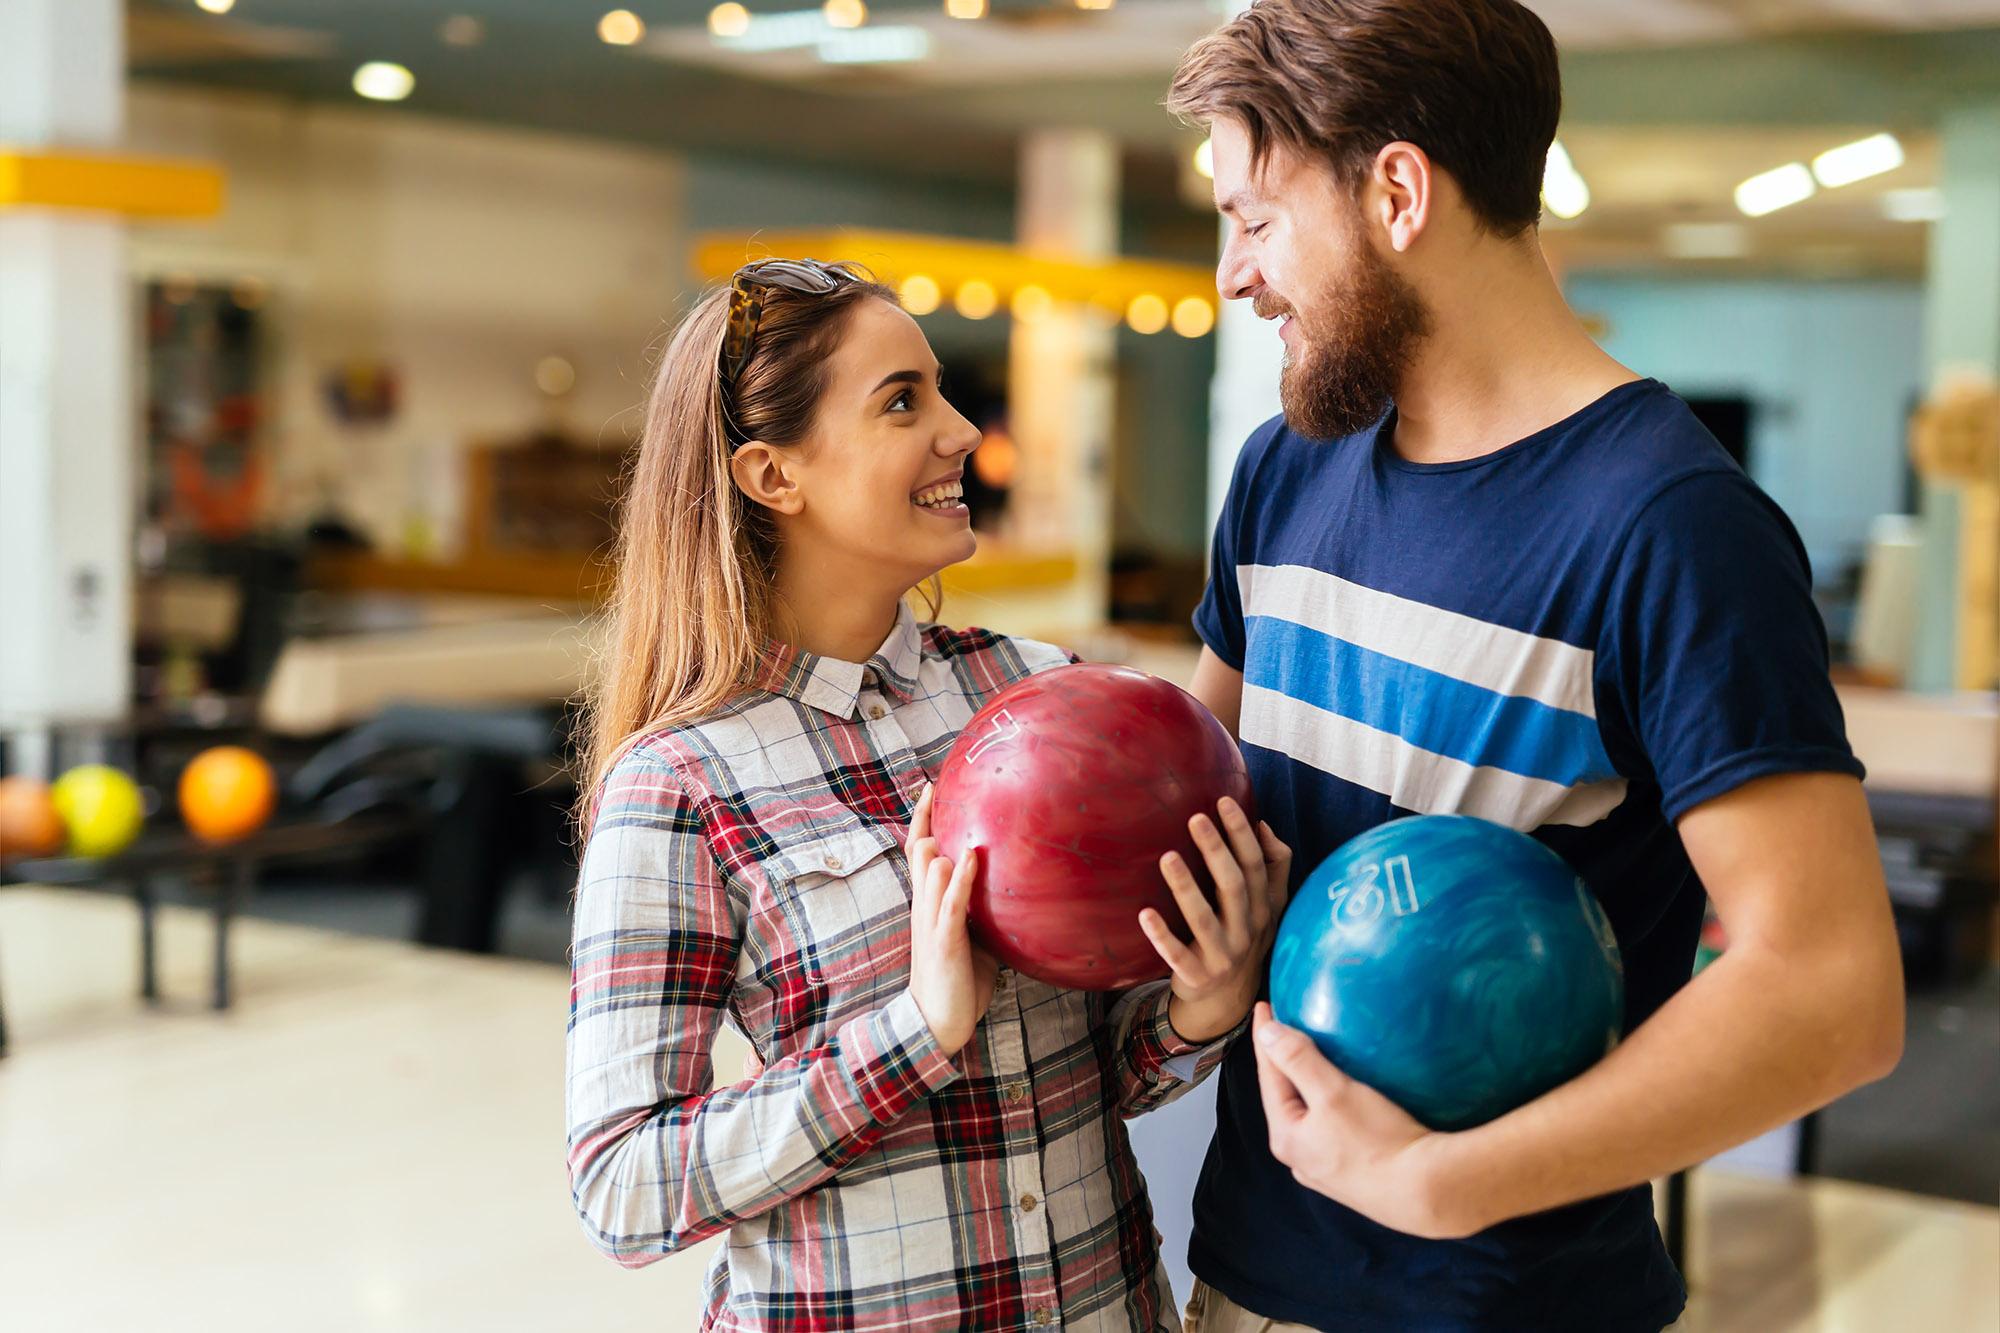 Couple Flirting